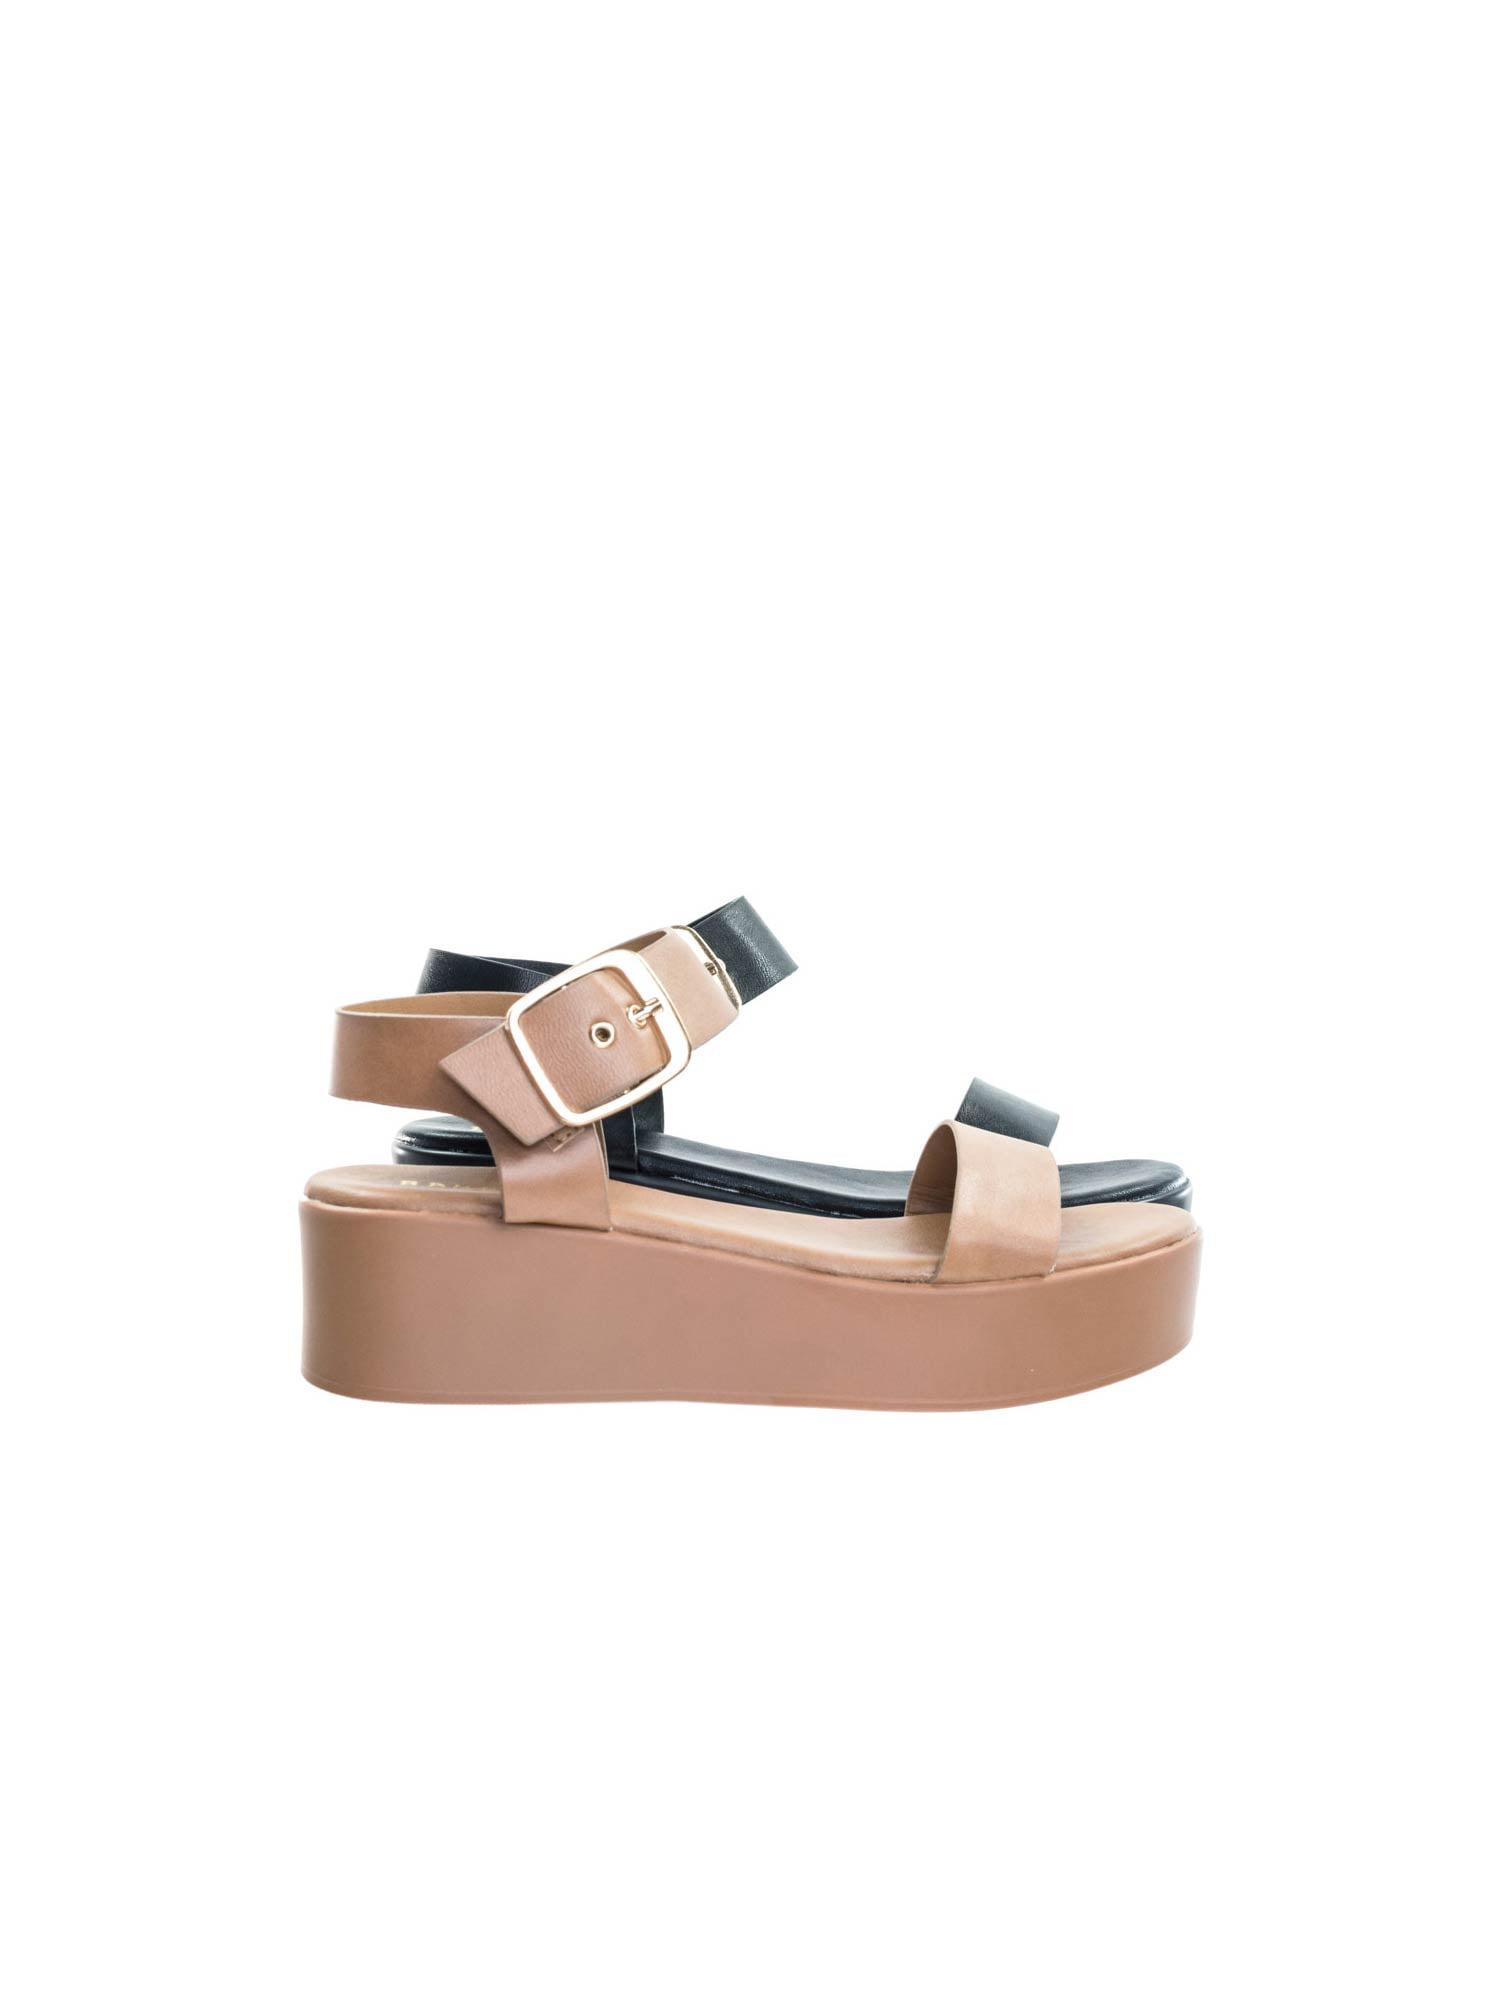 Bonus12 by Bamboo, Flatform Open Toe Sandal w Adjustable Ankle Strap